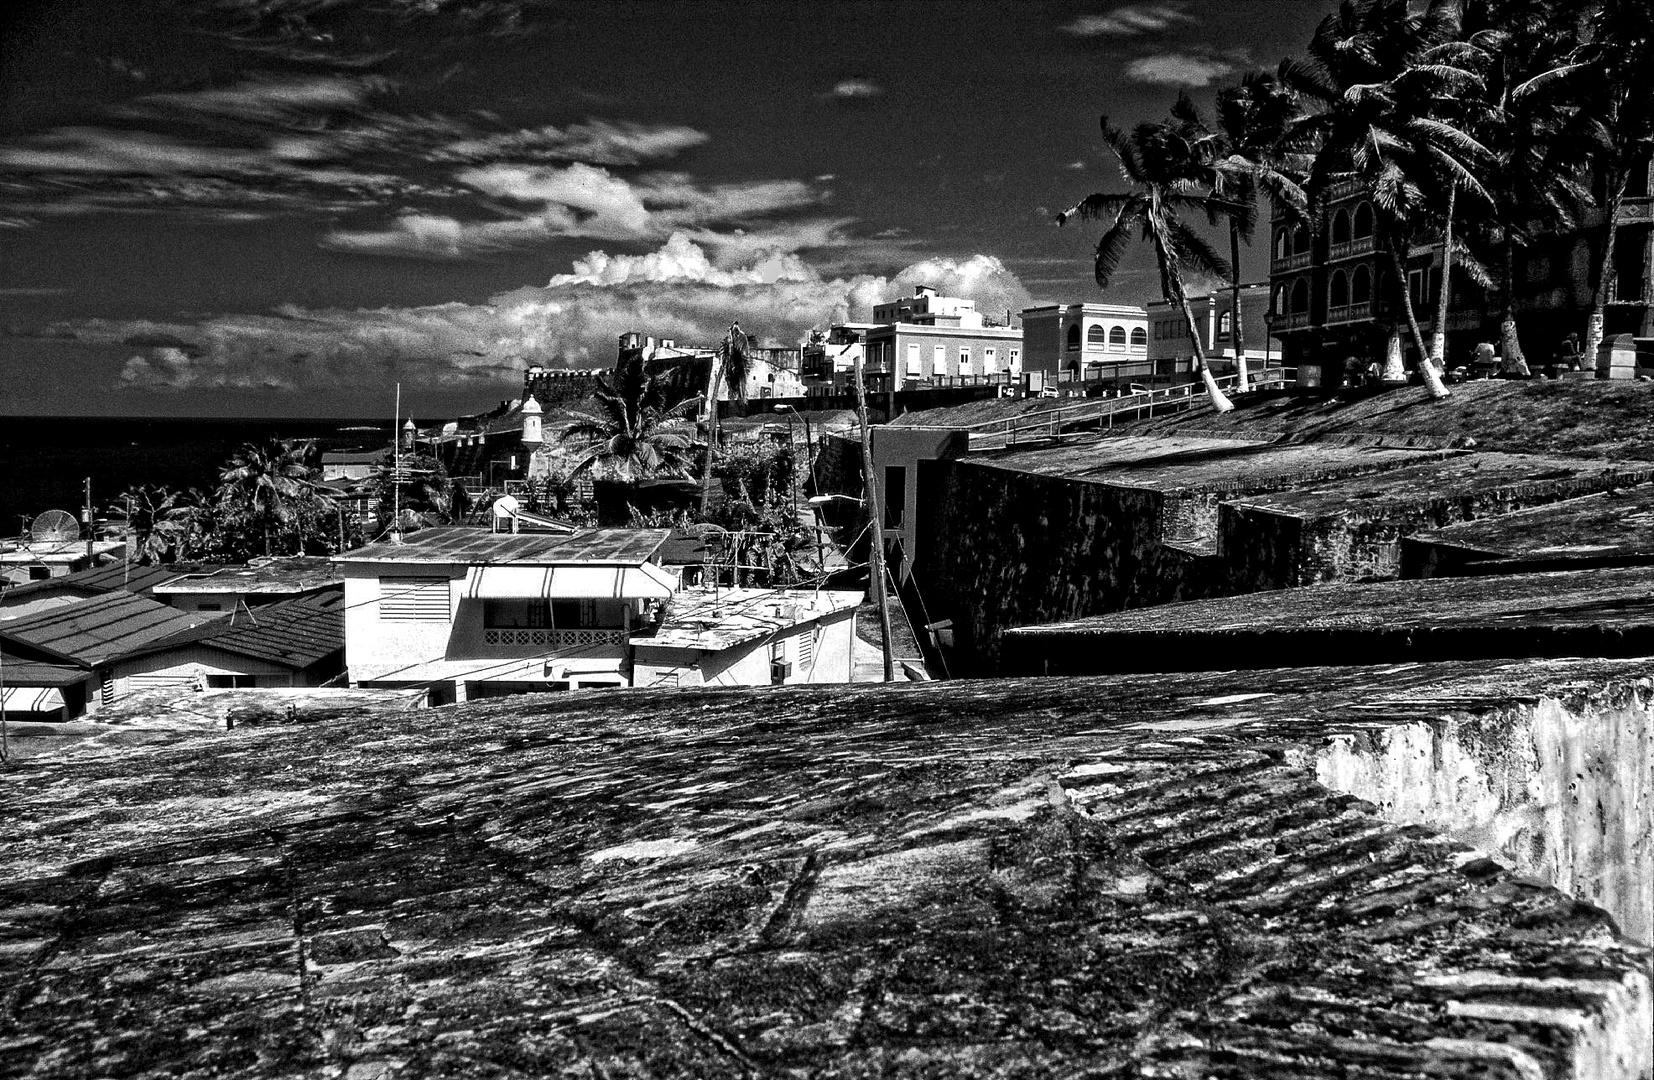 Caribbean shadows II (Salgado-style)